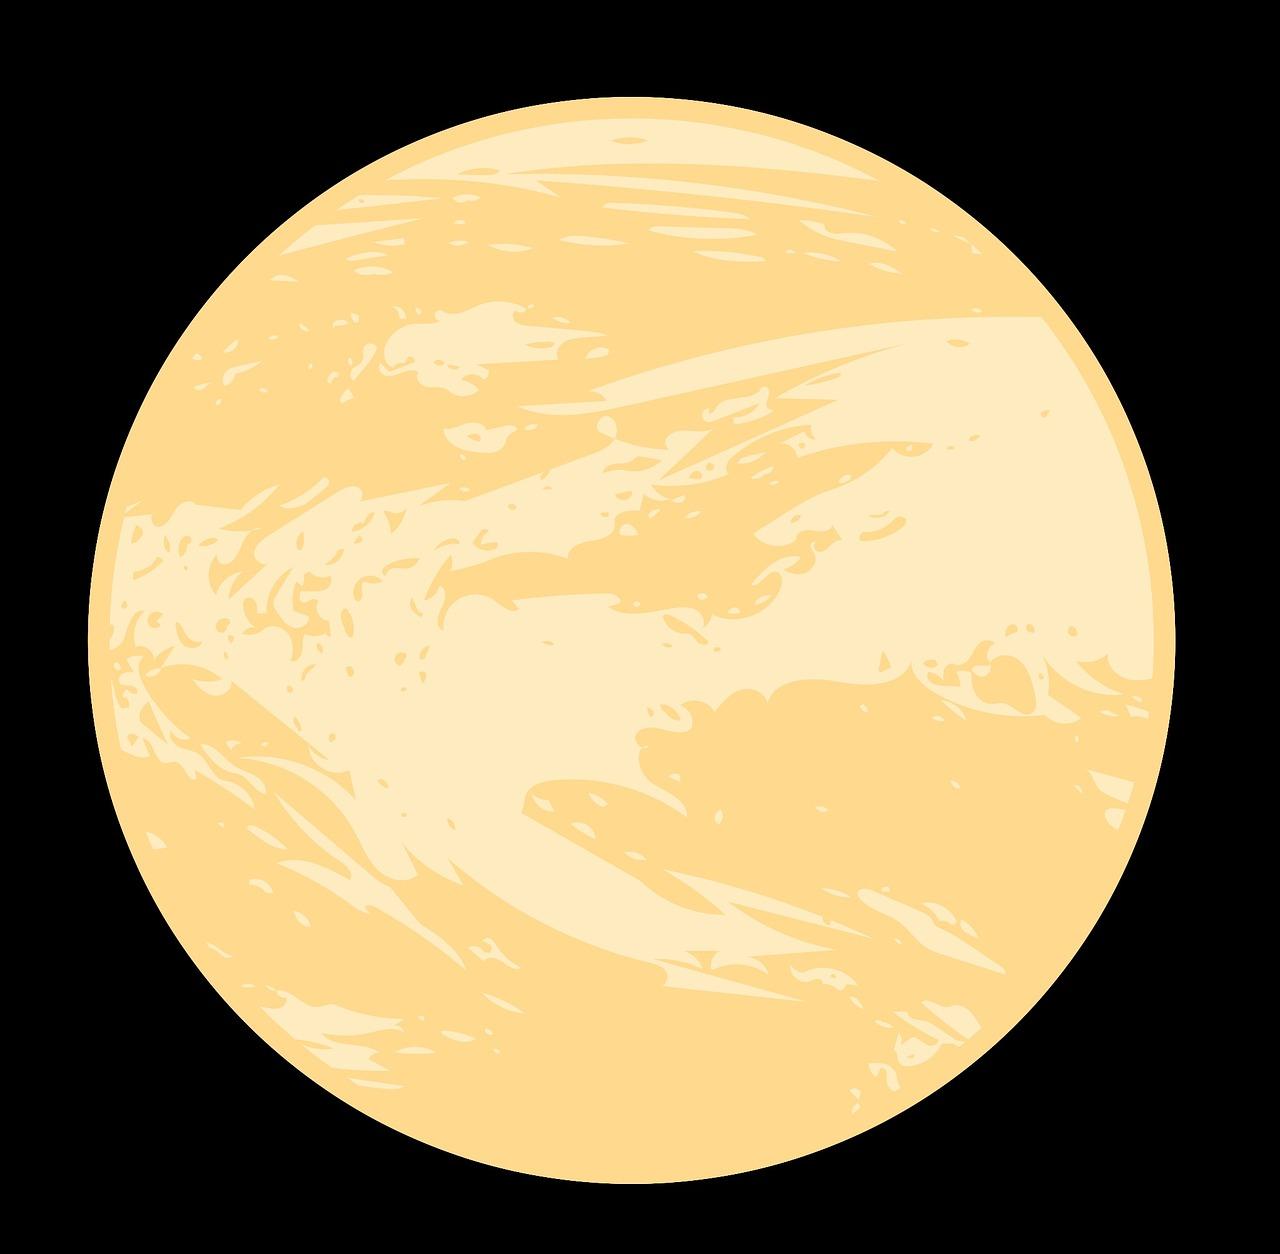 Венера планета картинки рисунки